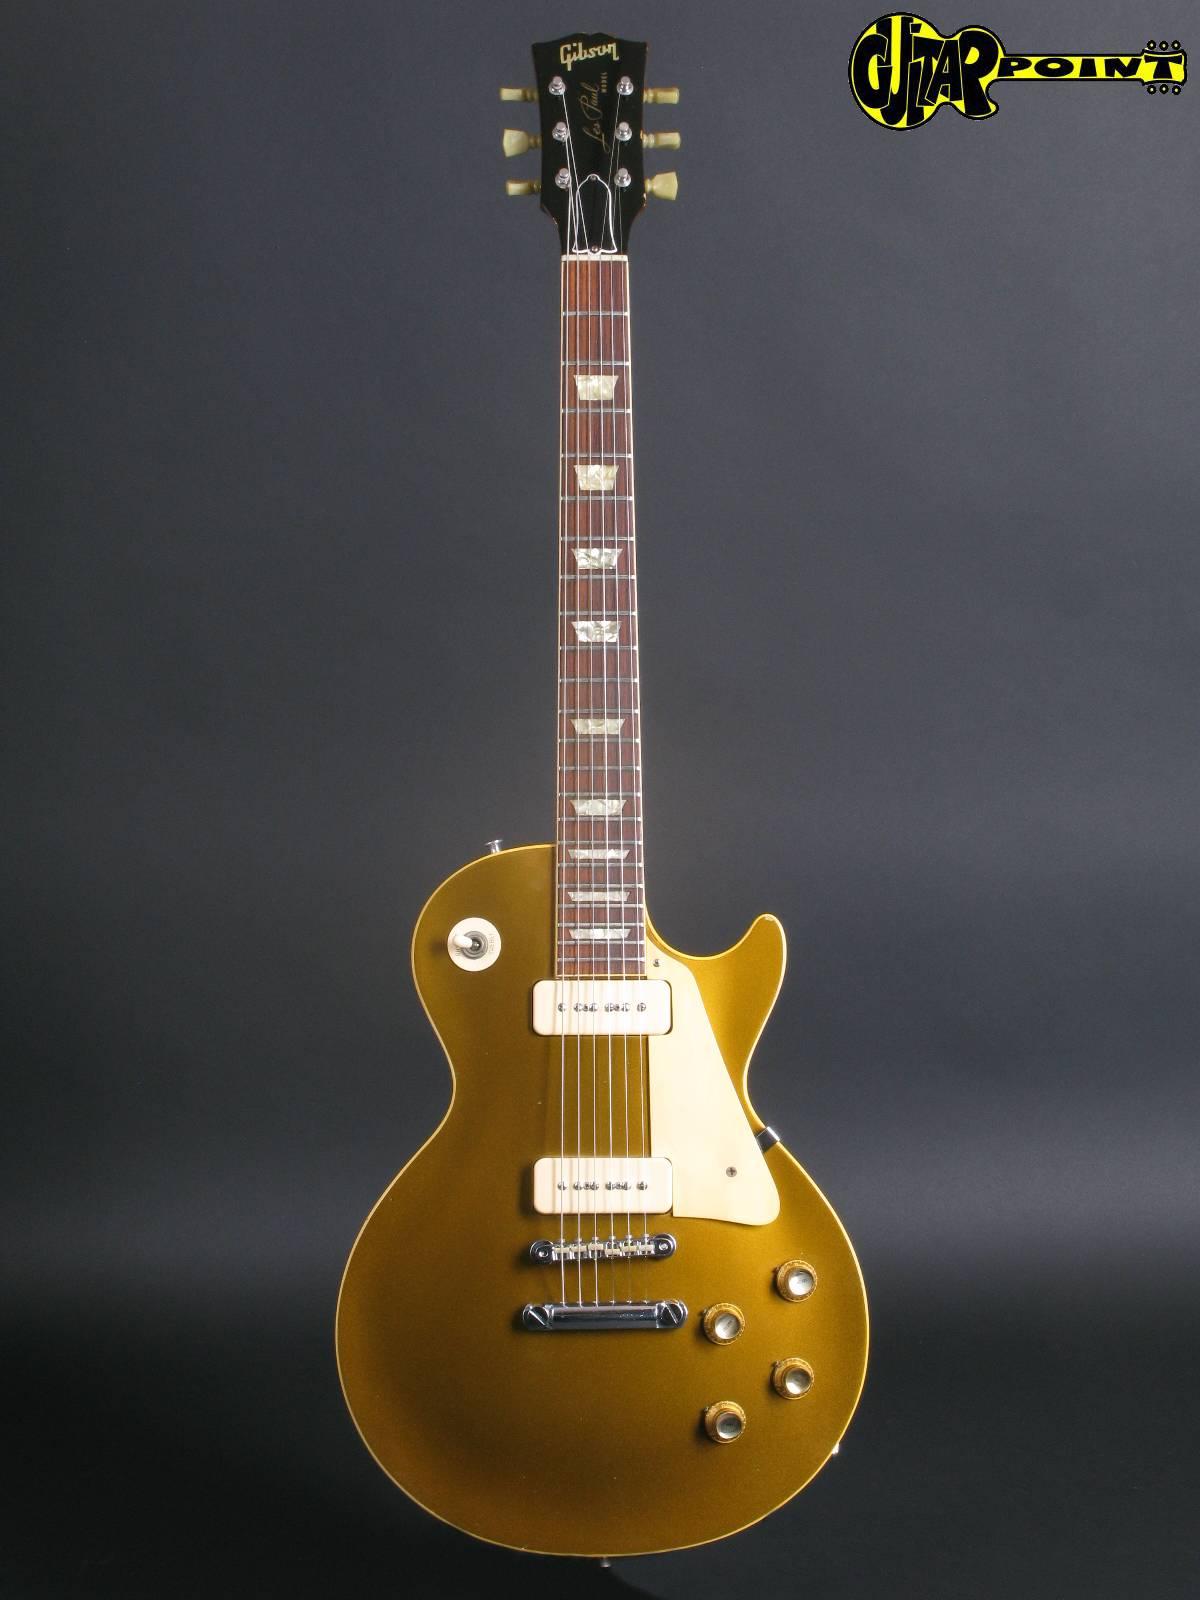 gibson les paul standard gold top 1968 gold top guitar for sale guitarpoint. Black Bedroom Furniture Sets. Home Design Ideas